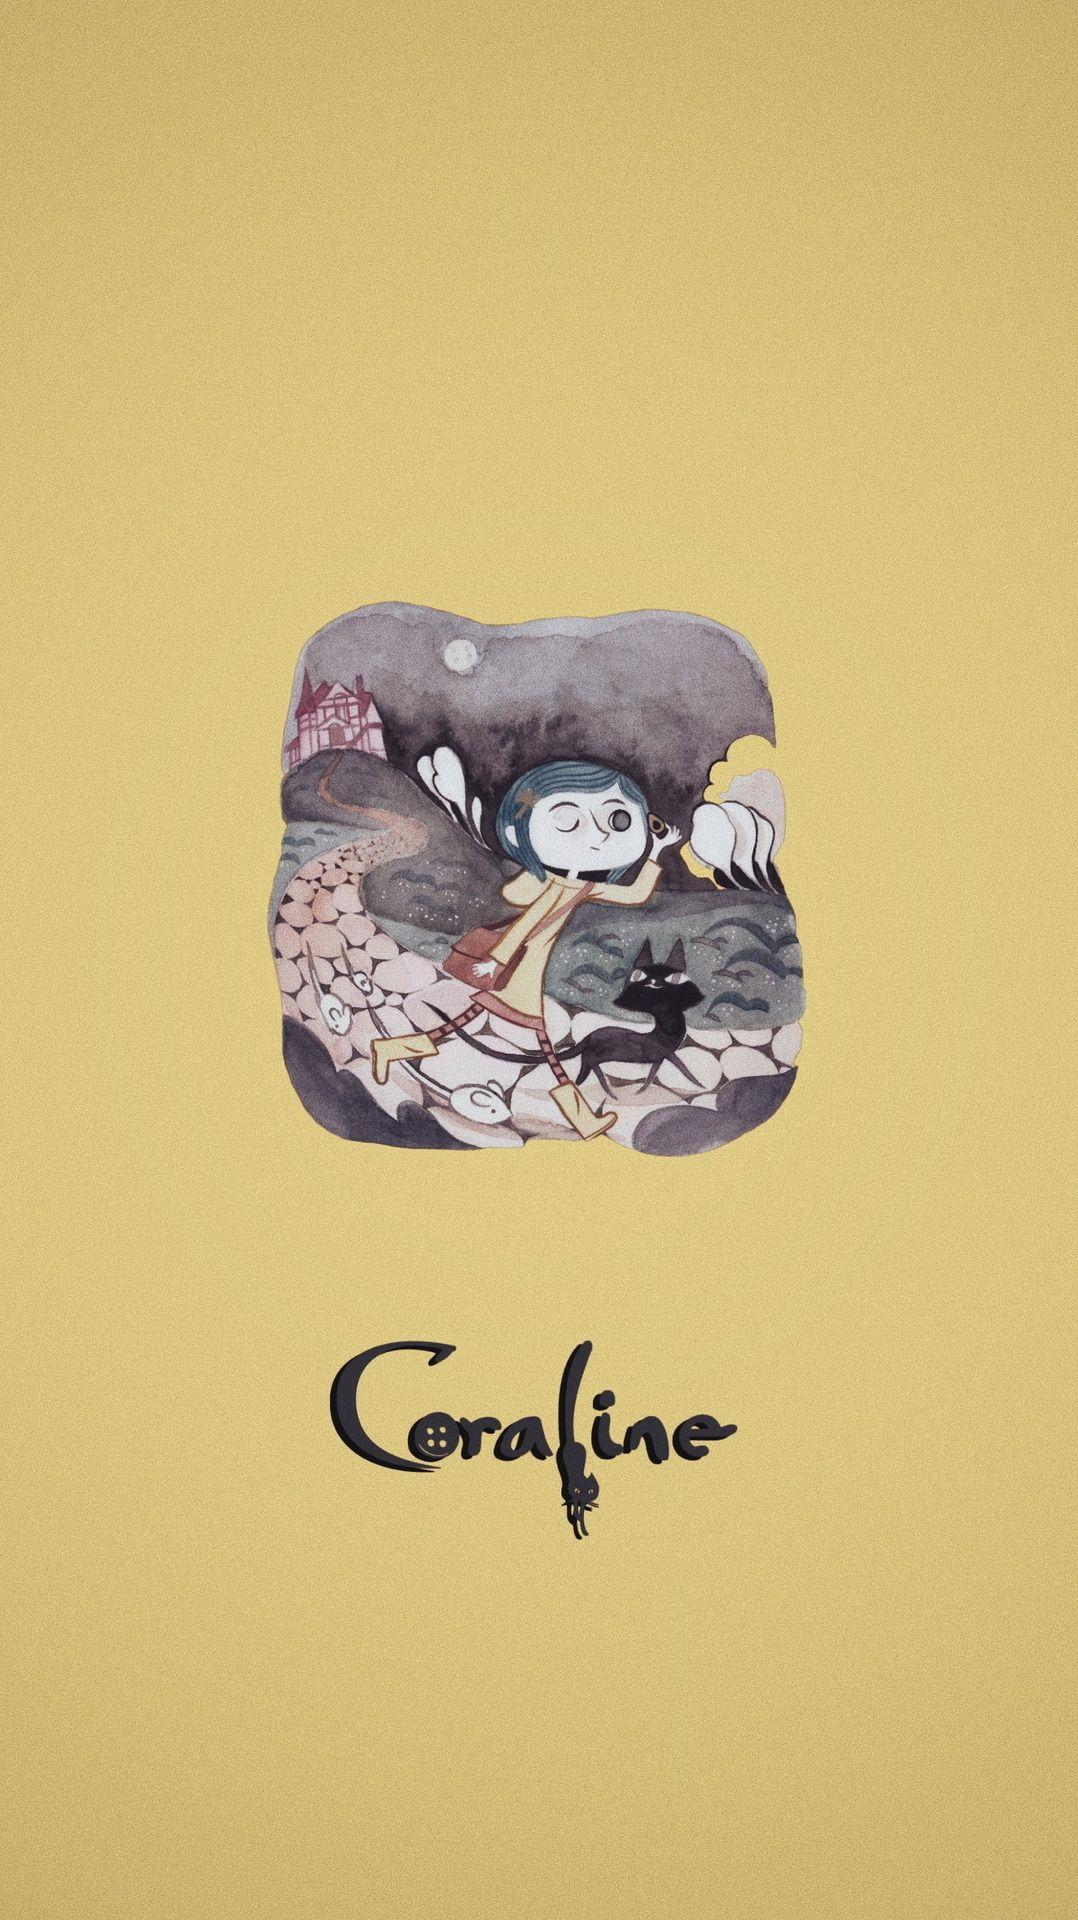 Coraline Tumblr Coraline Aesthetic Coraline Coraline Art